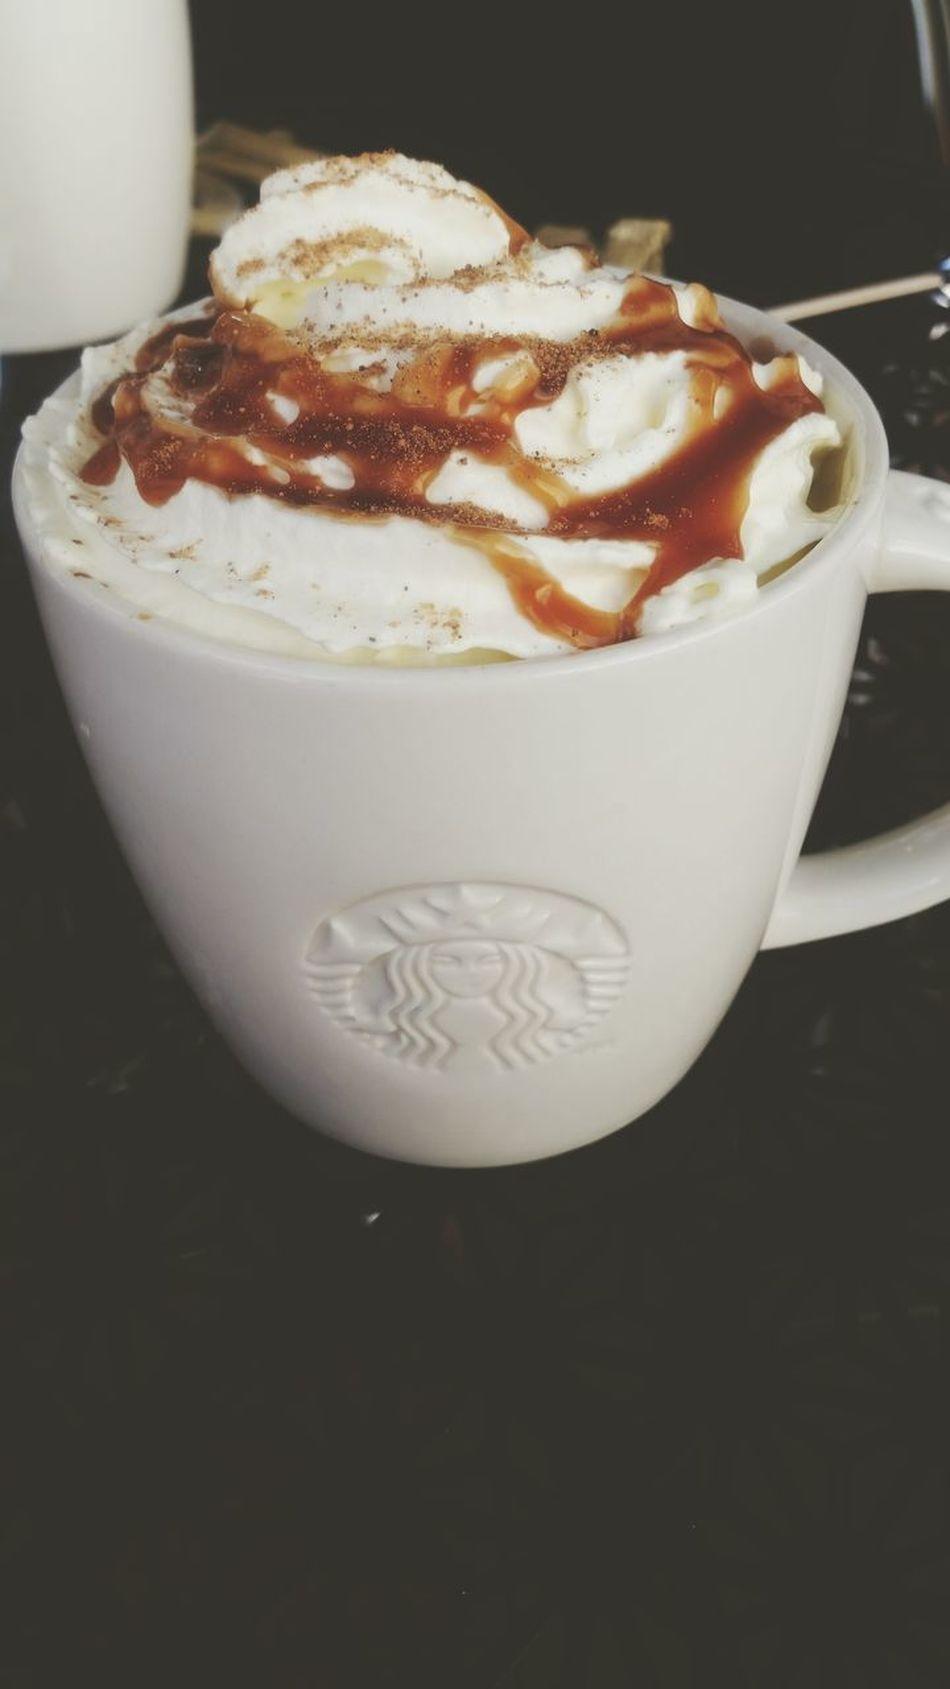 Coffee - Drink Latte Coffee Cup Nut Macadamia Toffee Milk Friend ♡ Townlife Harlow Center Dessert ❤️😍